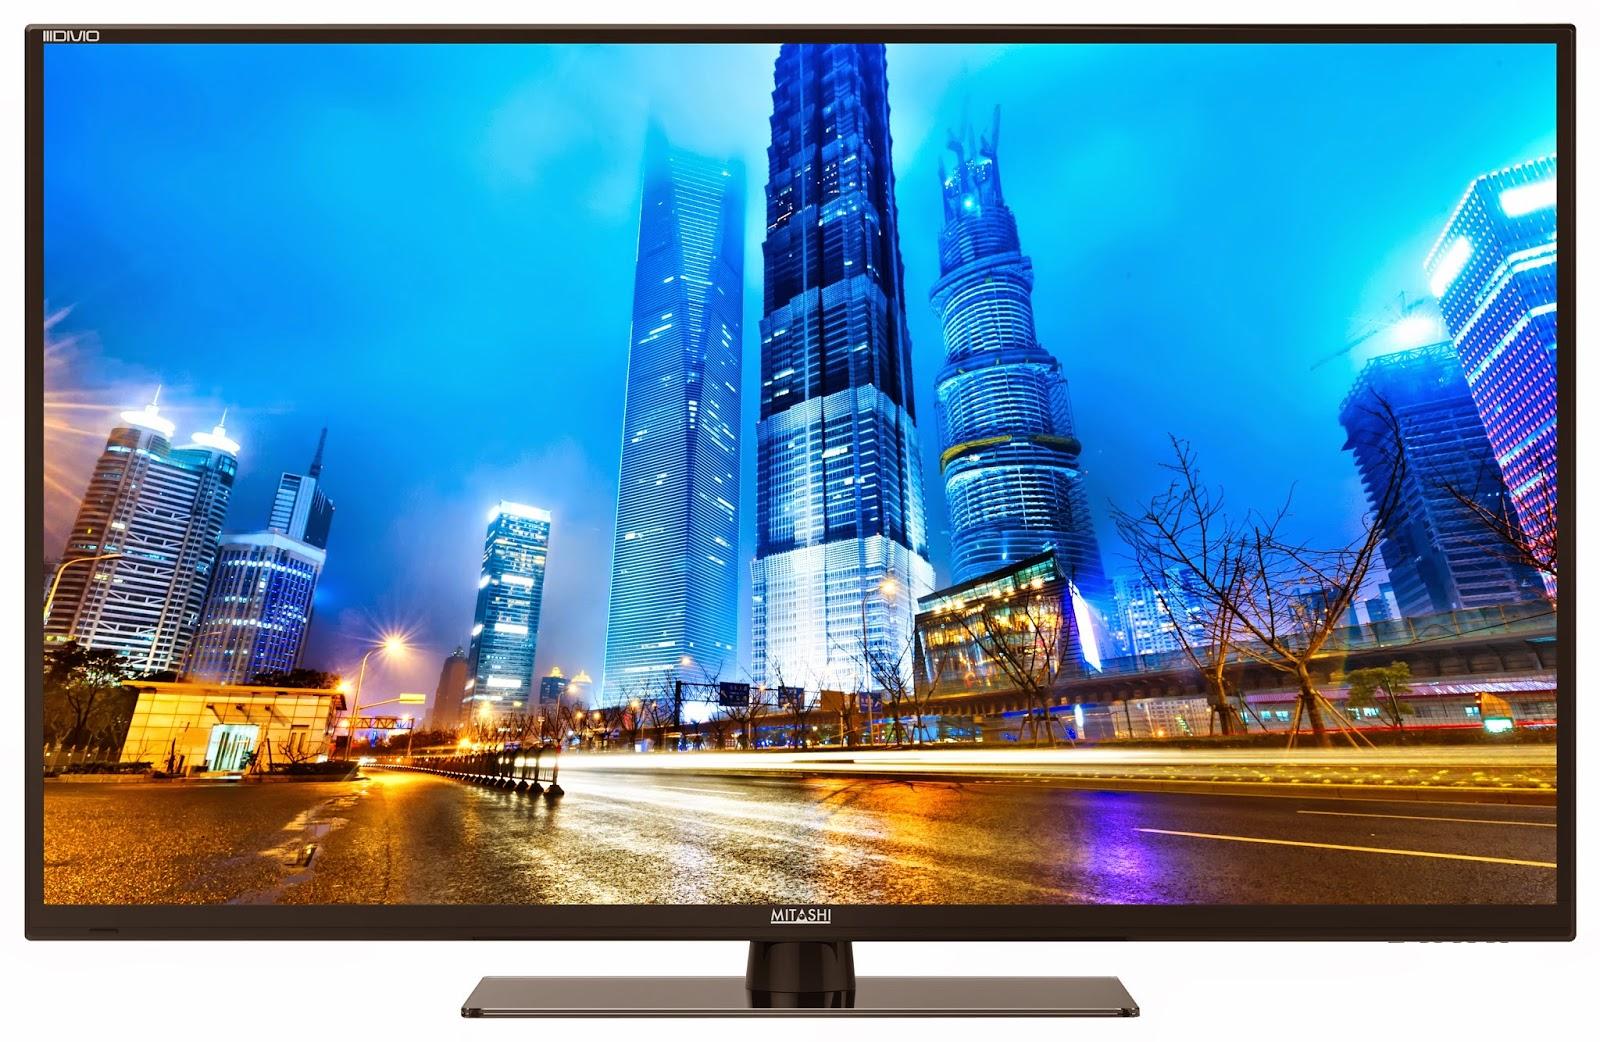 Mitashi 58-inch LED TV